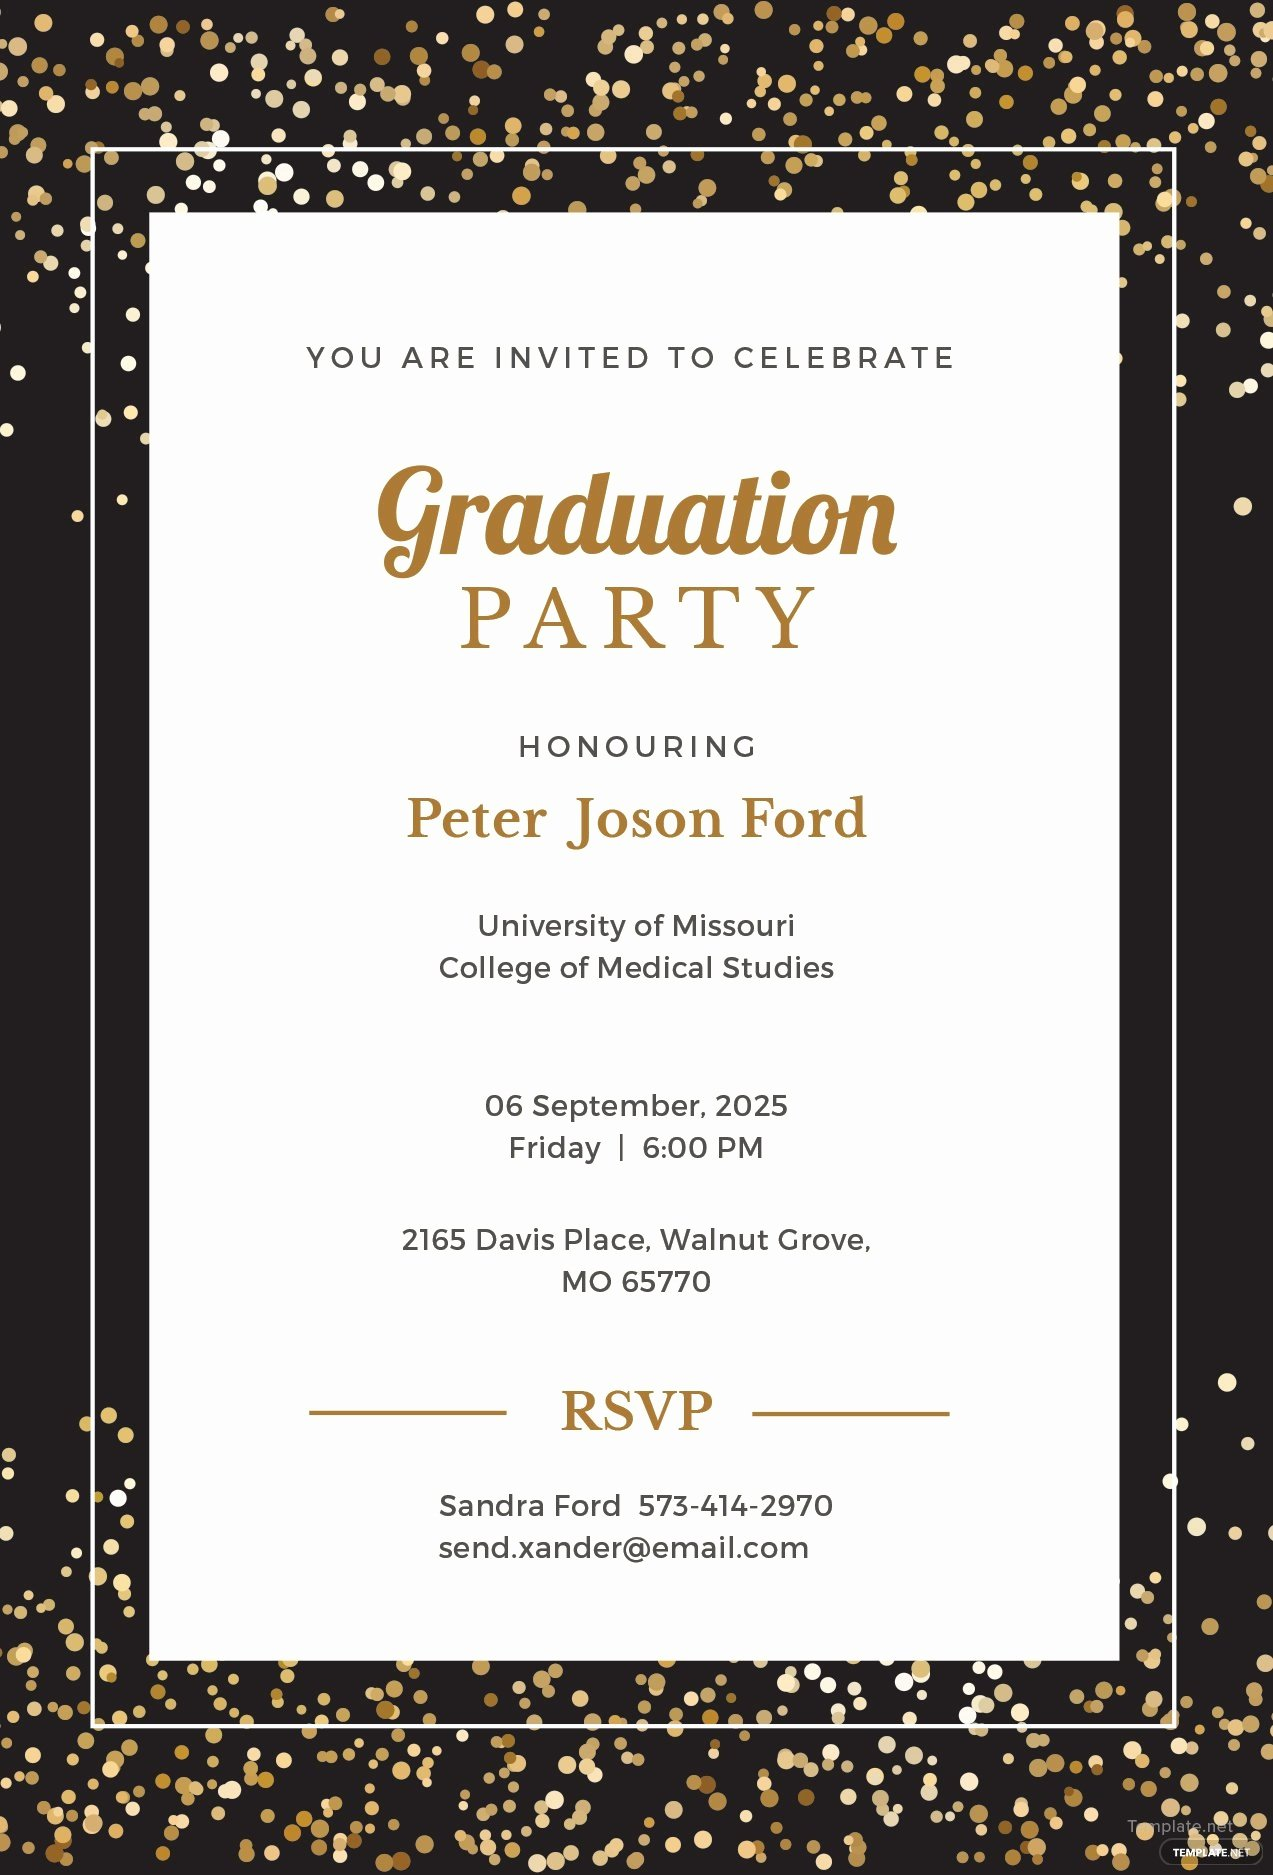 Graduation Invitation Templates Microsoft Word Fresh Free Simple Graduation Invitation Template In Microsoft